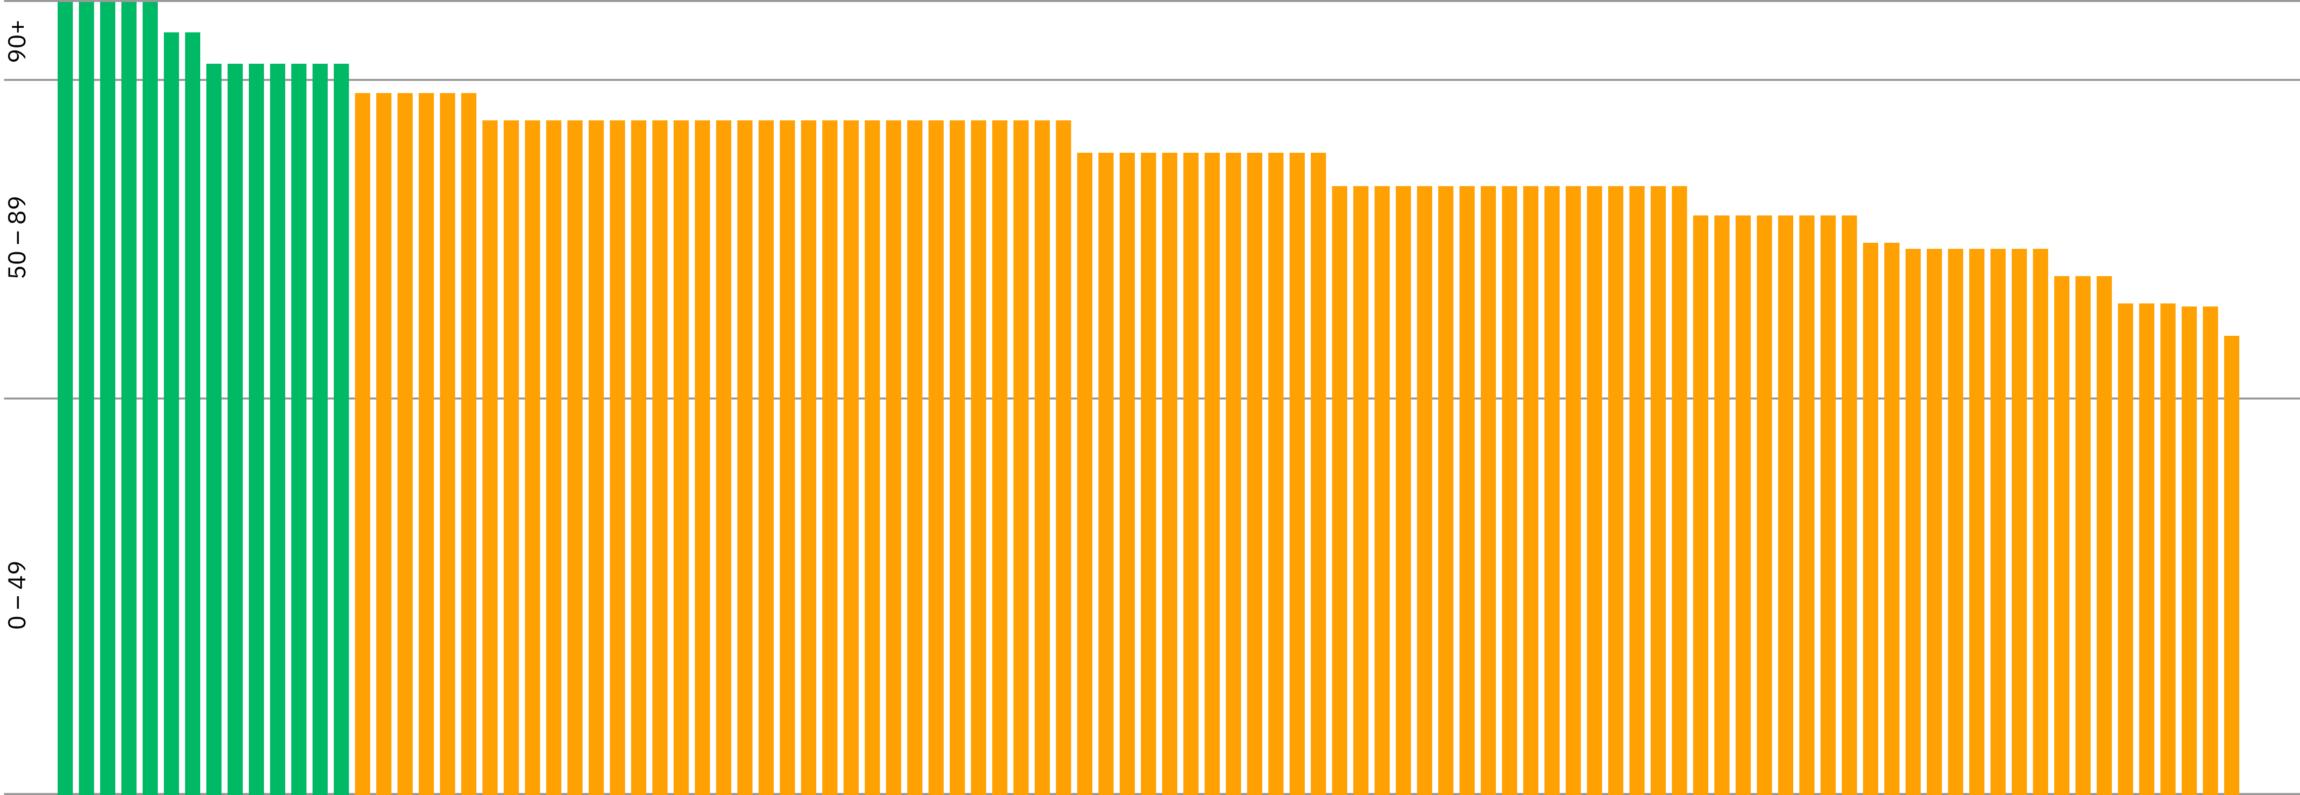 Bar chart showing the AJ100 websites best practice scores.